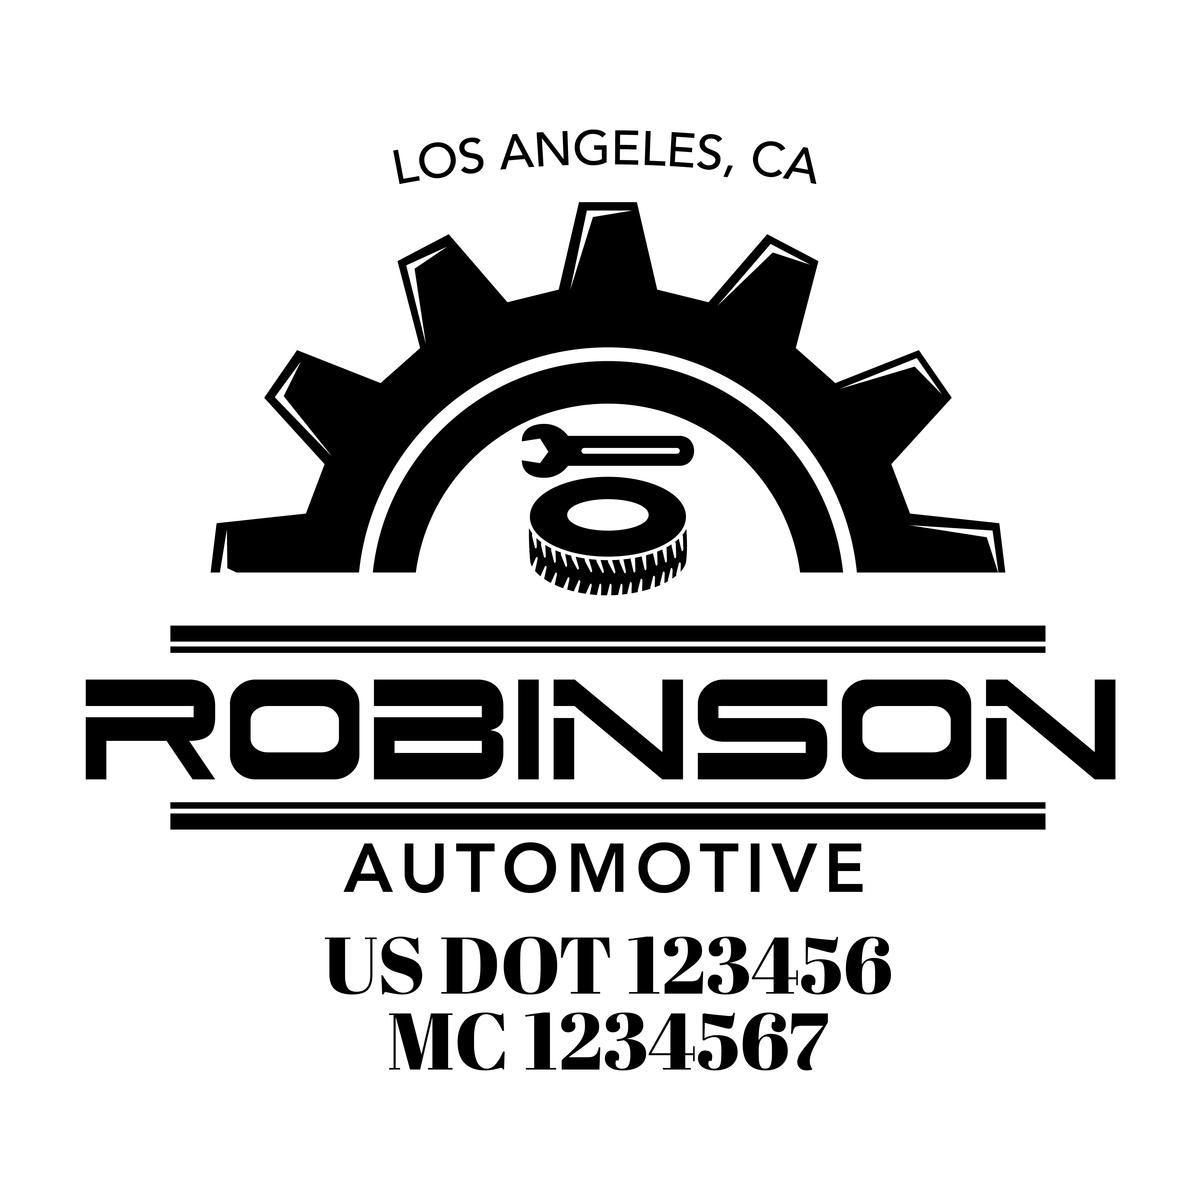 Mechanic Auto Repair Auto Body Shop Company Decal 2 Pack Auto Body Shop Auto Repair Auto Body